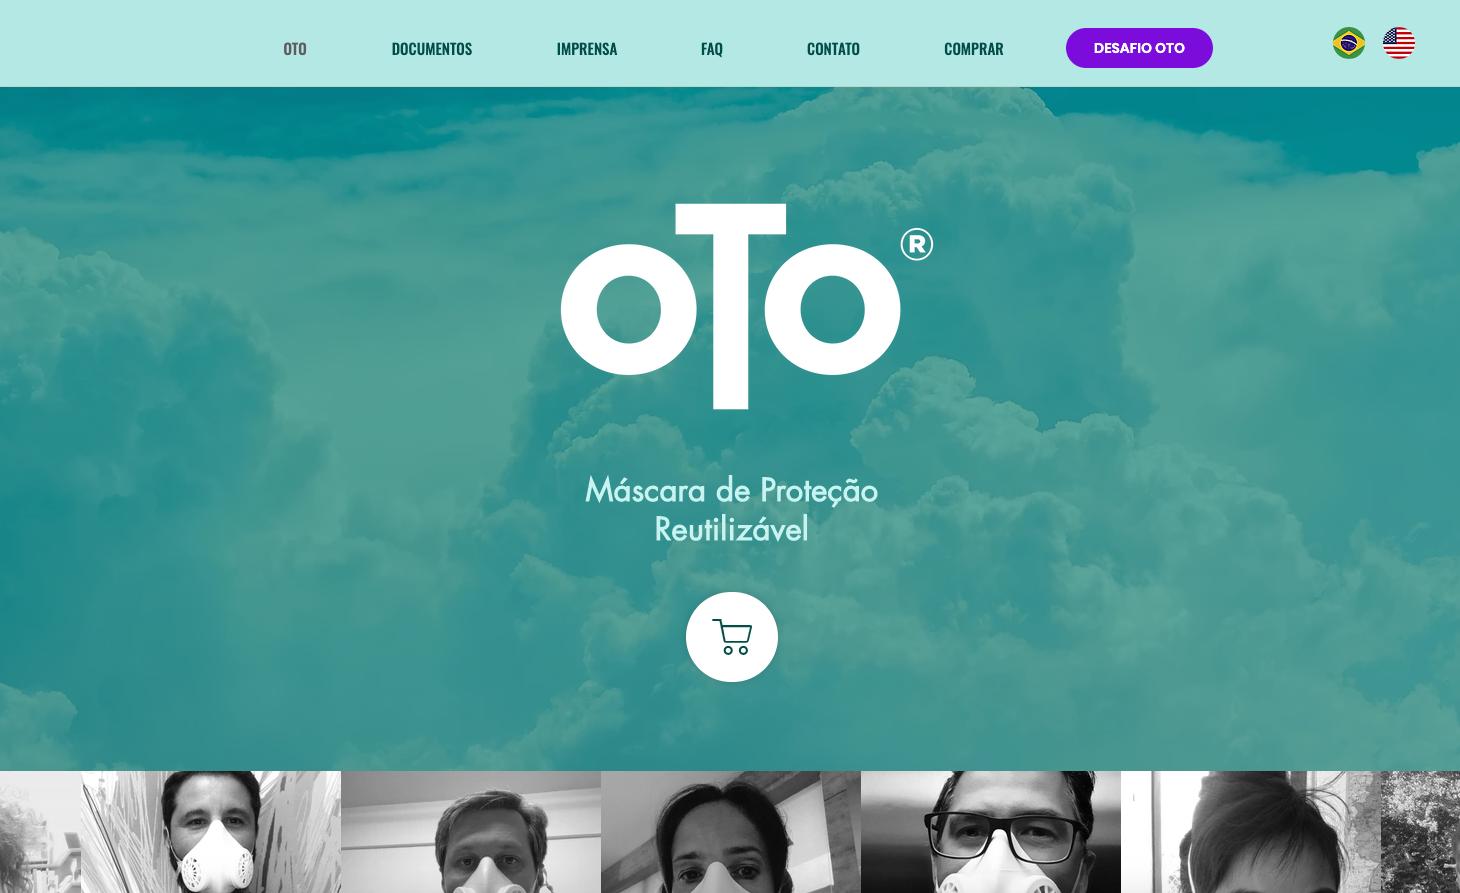 OTO-desktop1.png